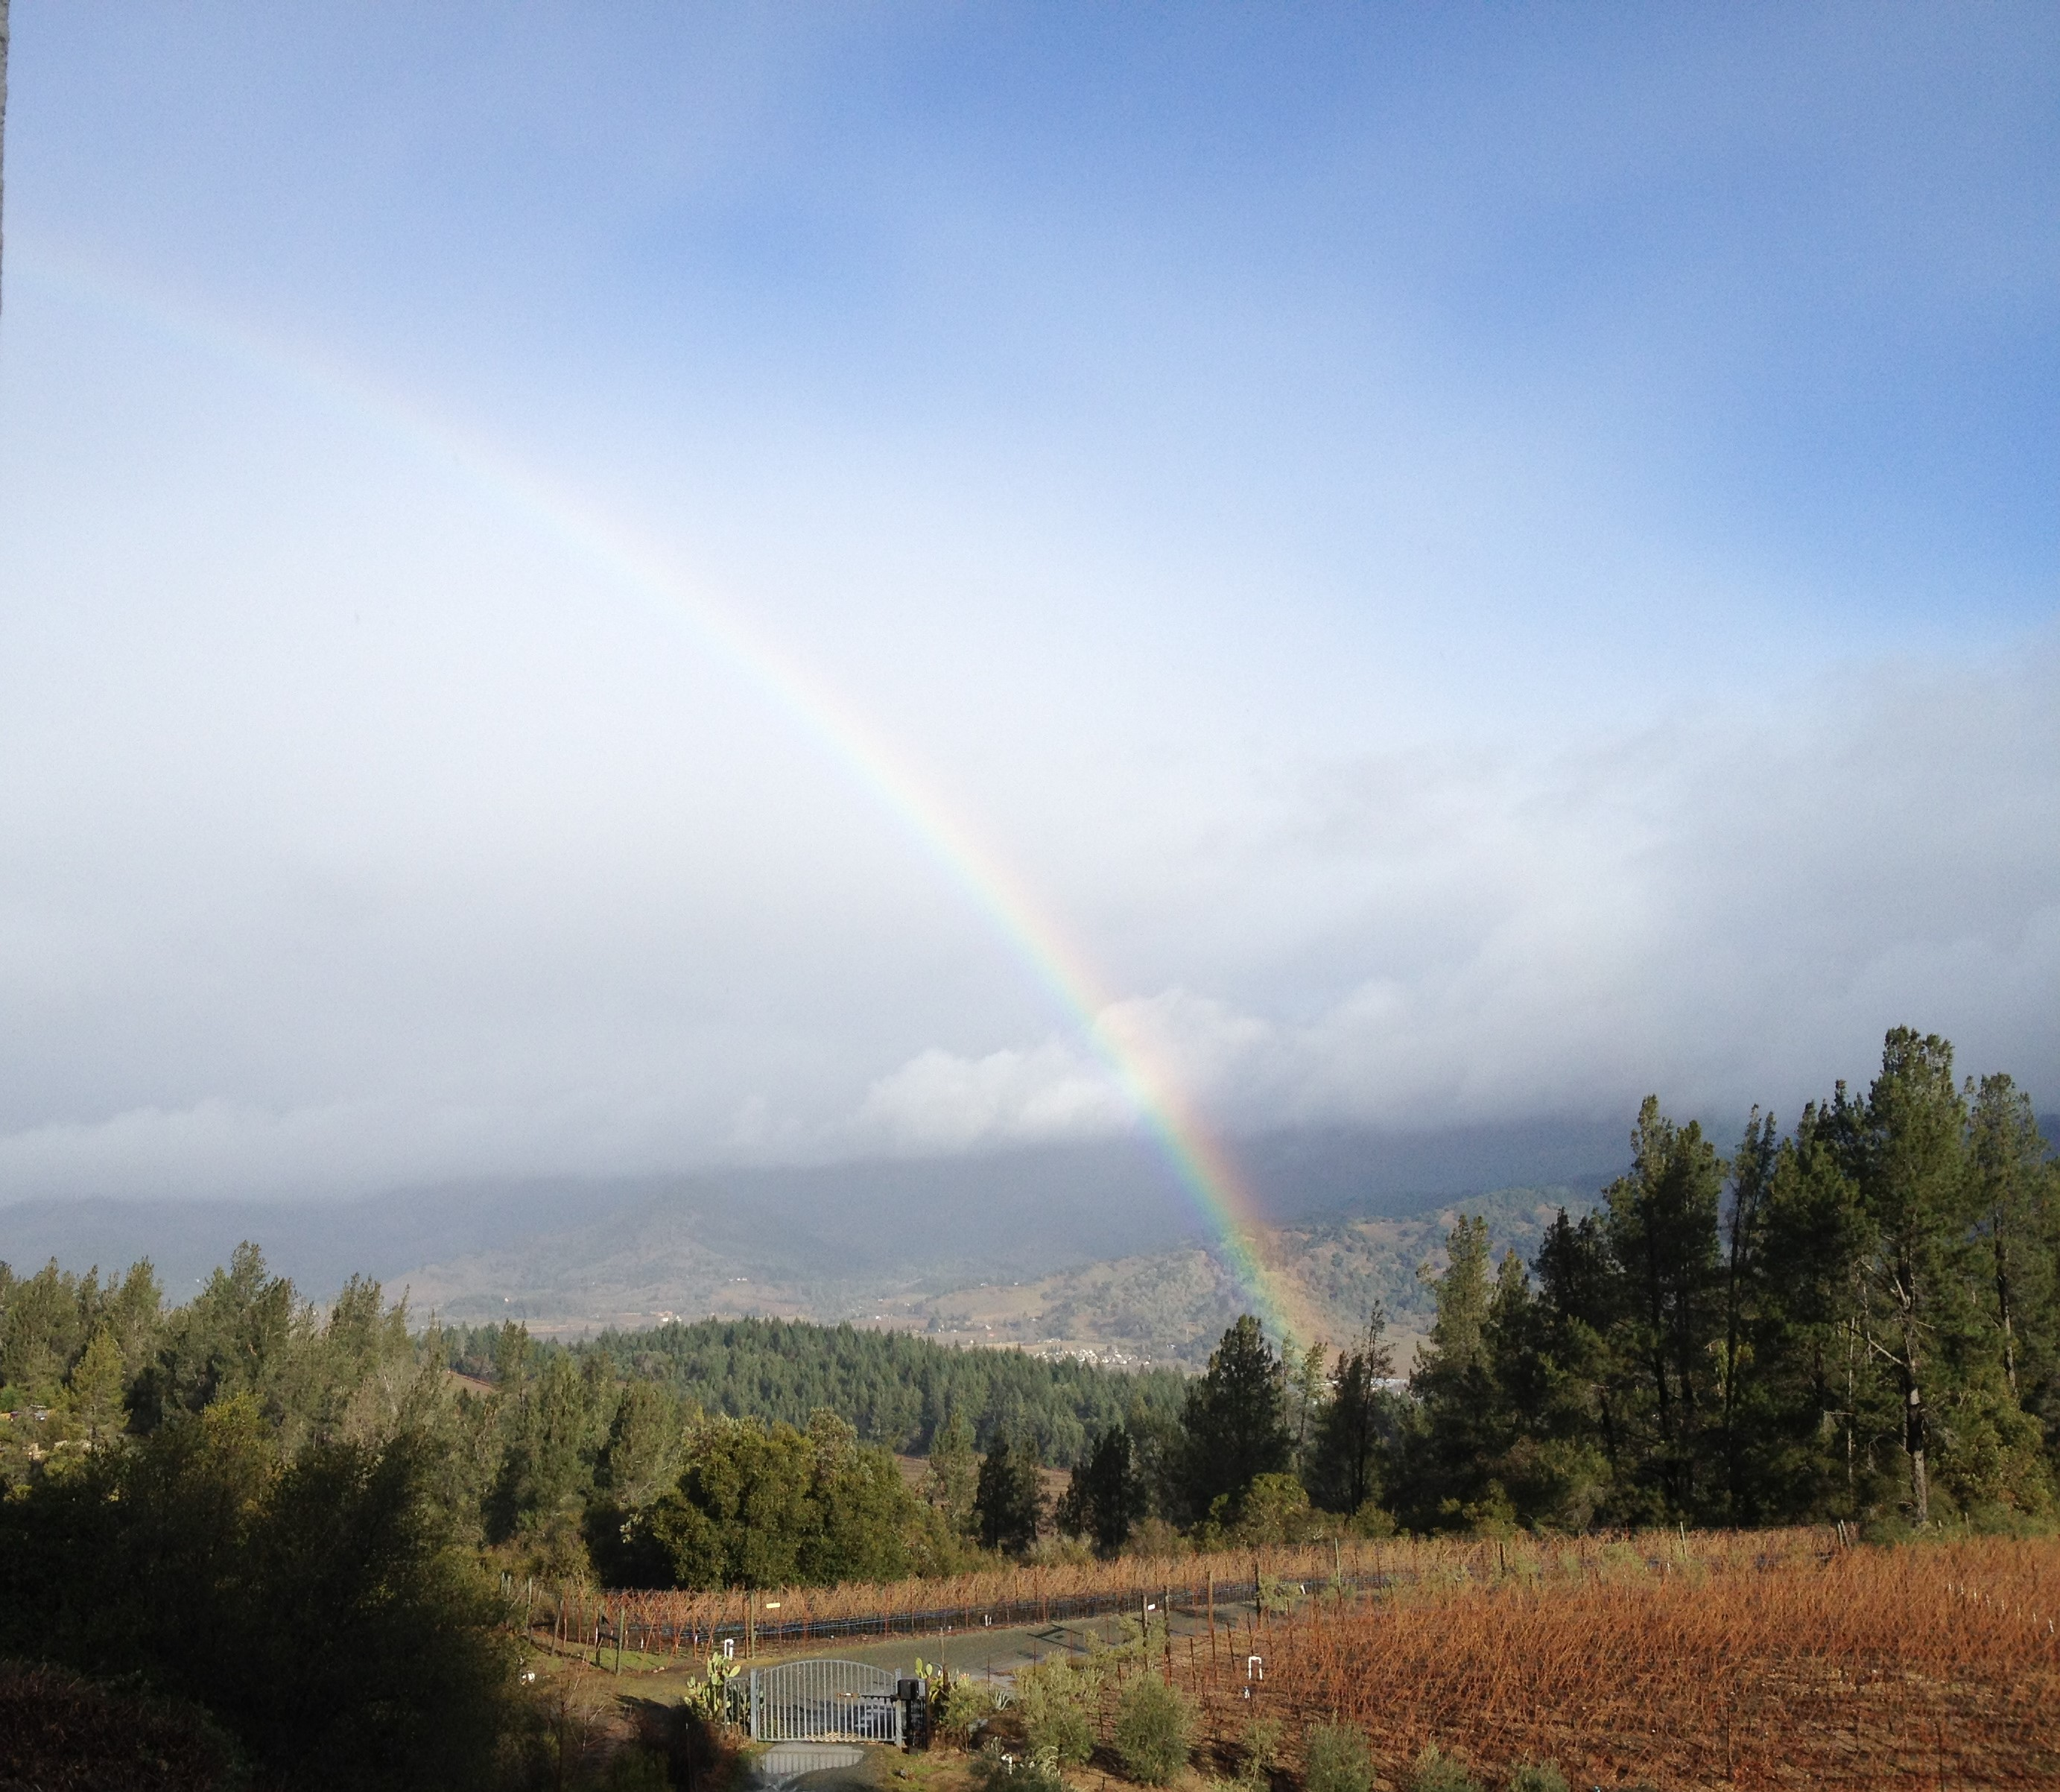 mueller family vineyards rainbow